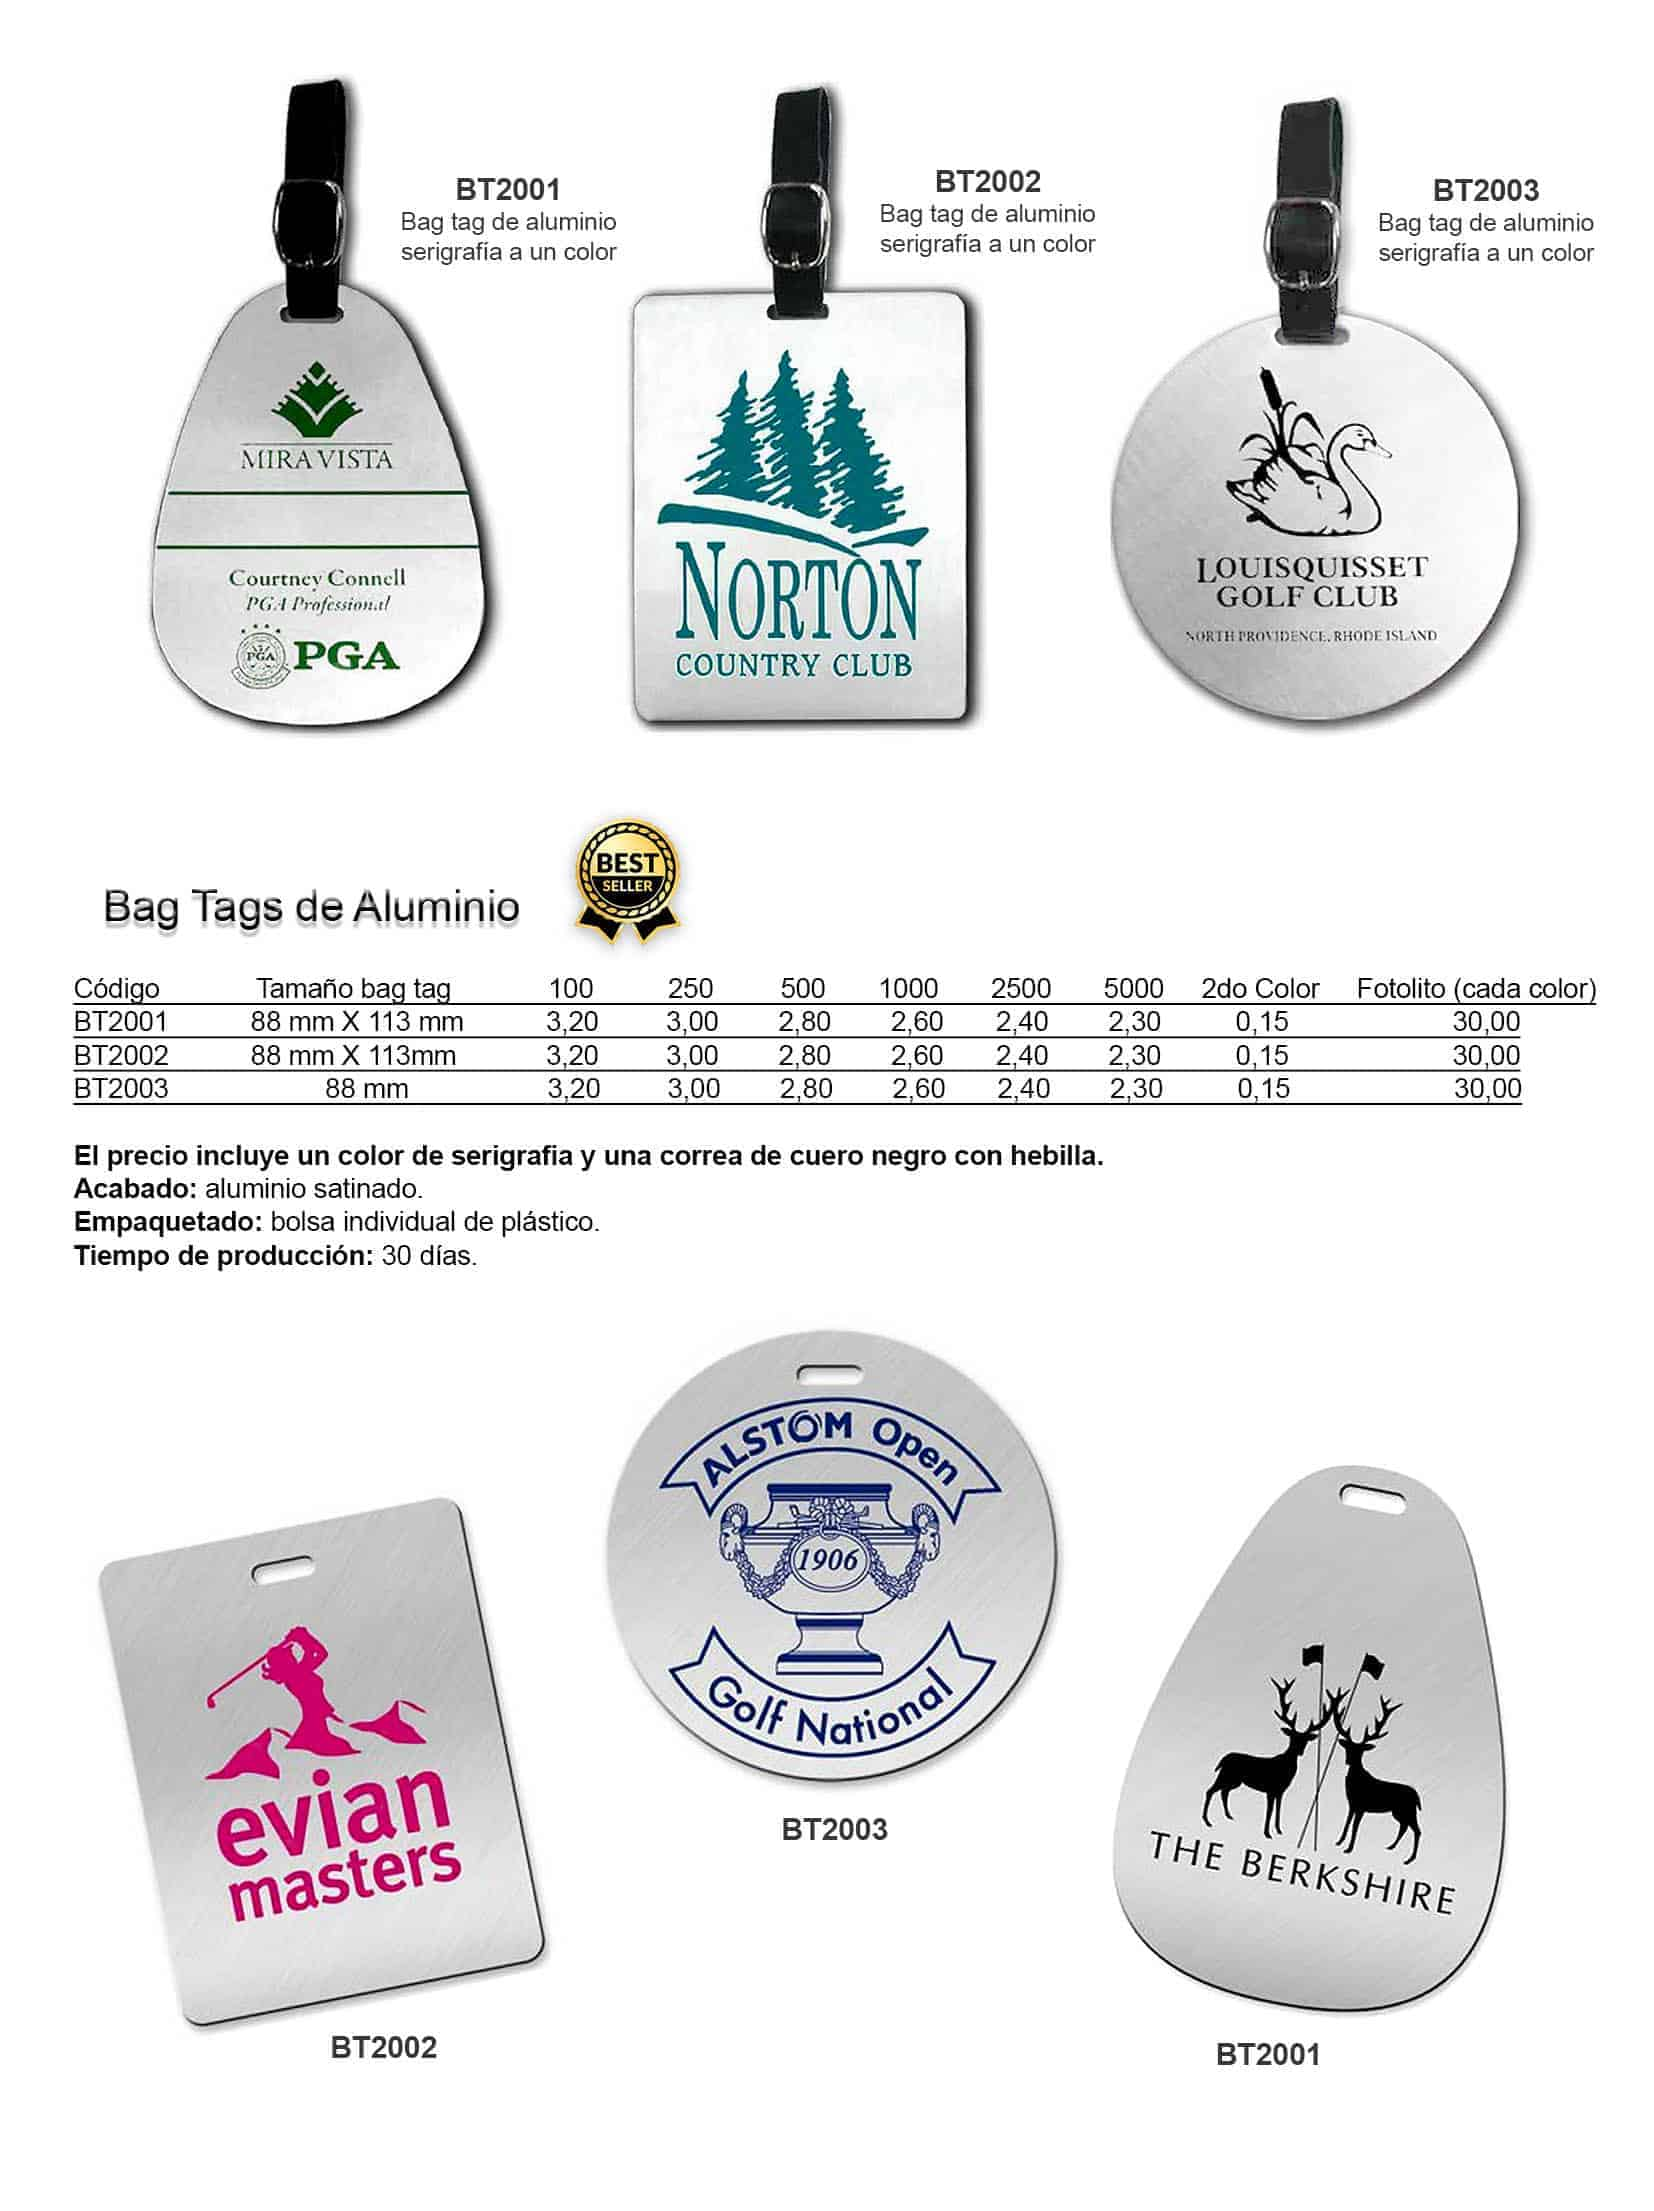 Bag tags de aluminio personalizados